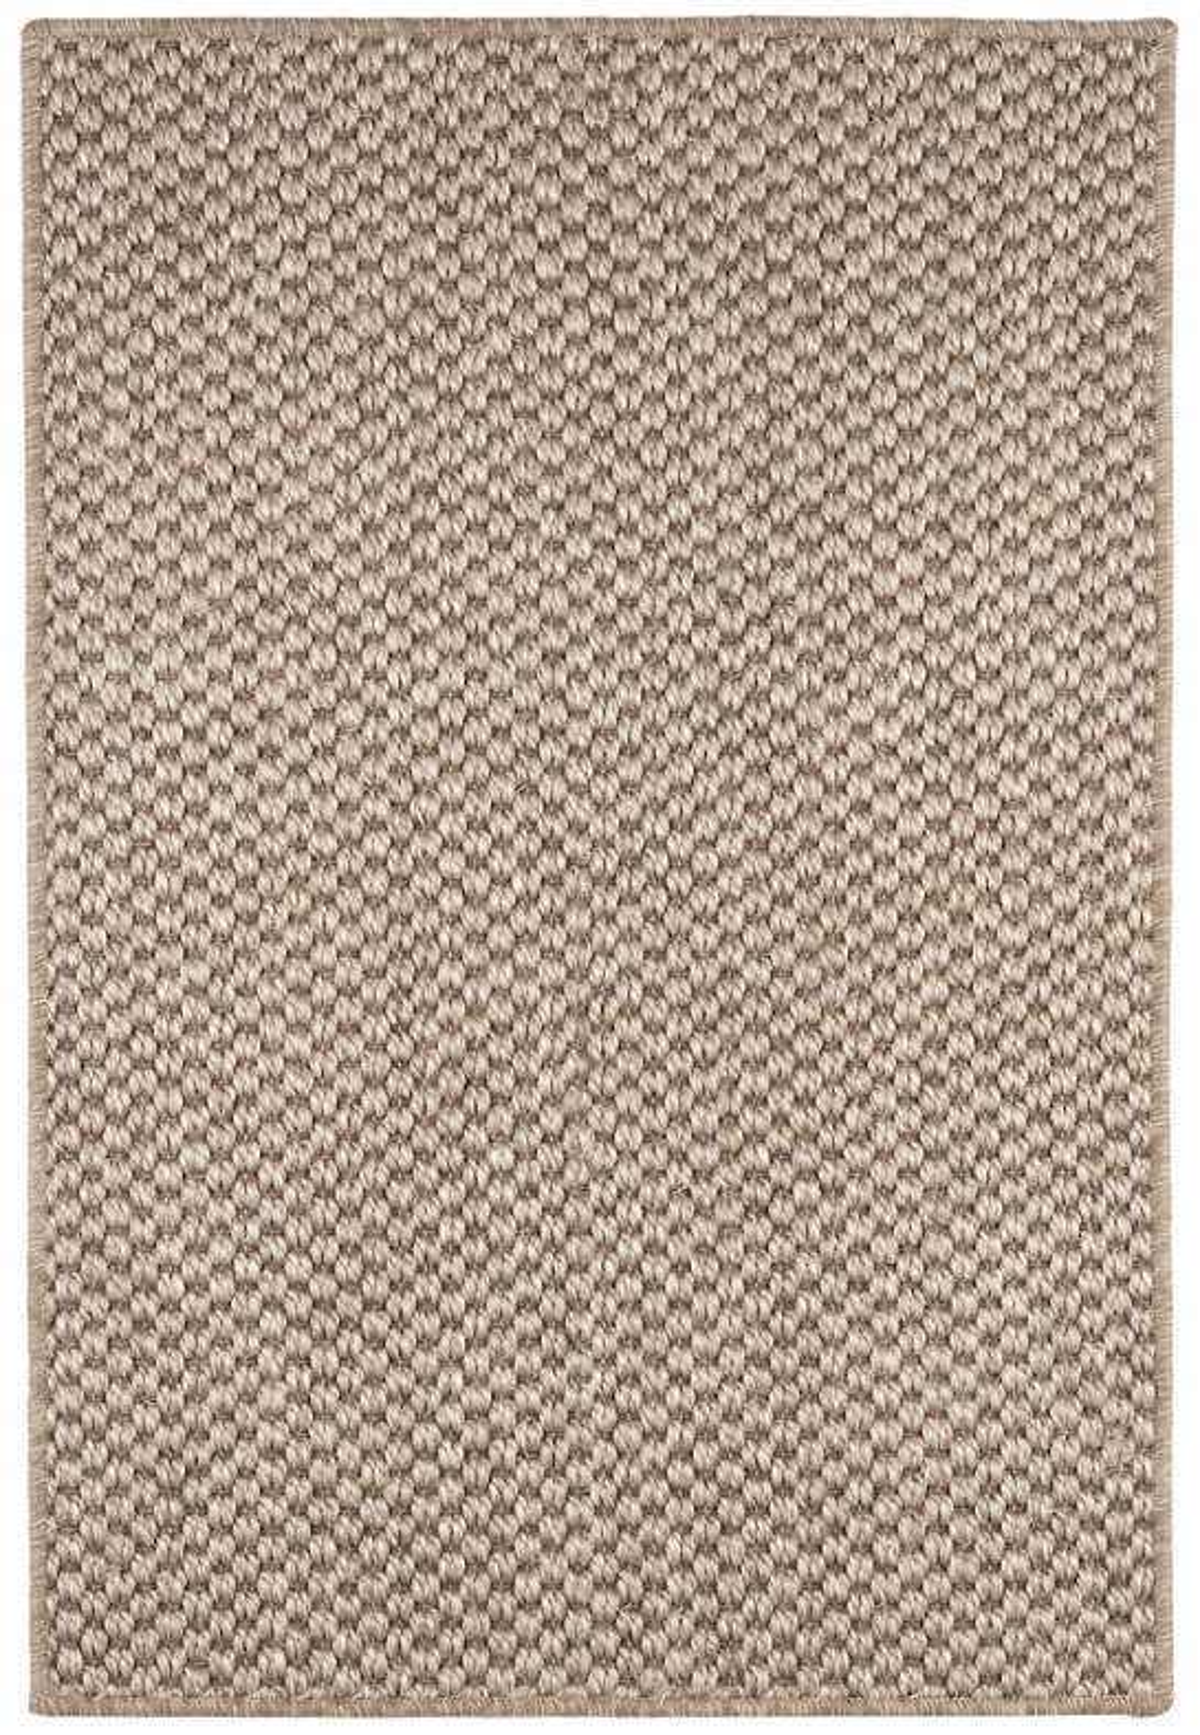 Corden Taupe Woven Sisal Custom Rug